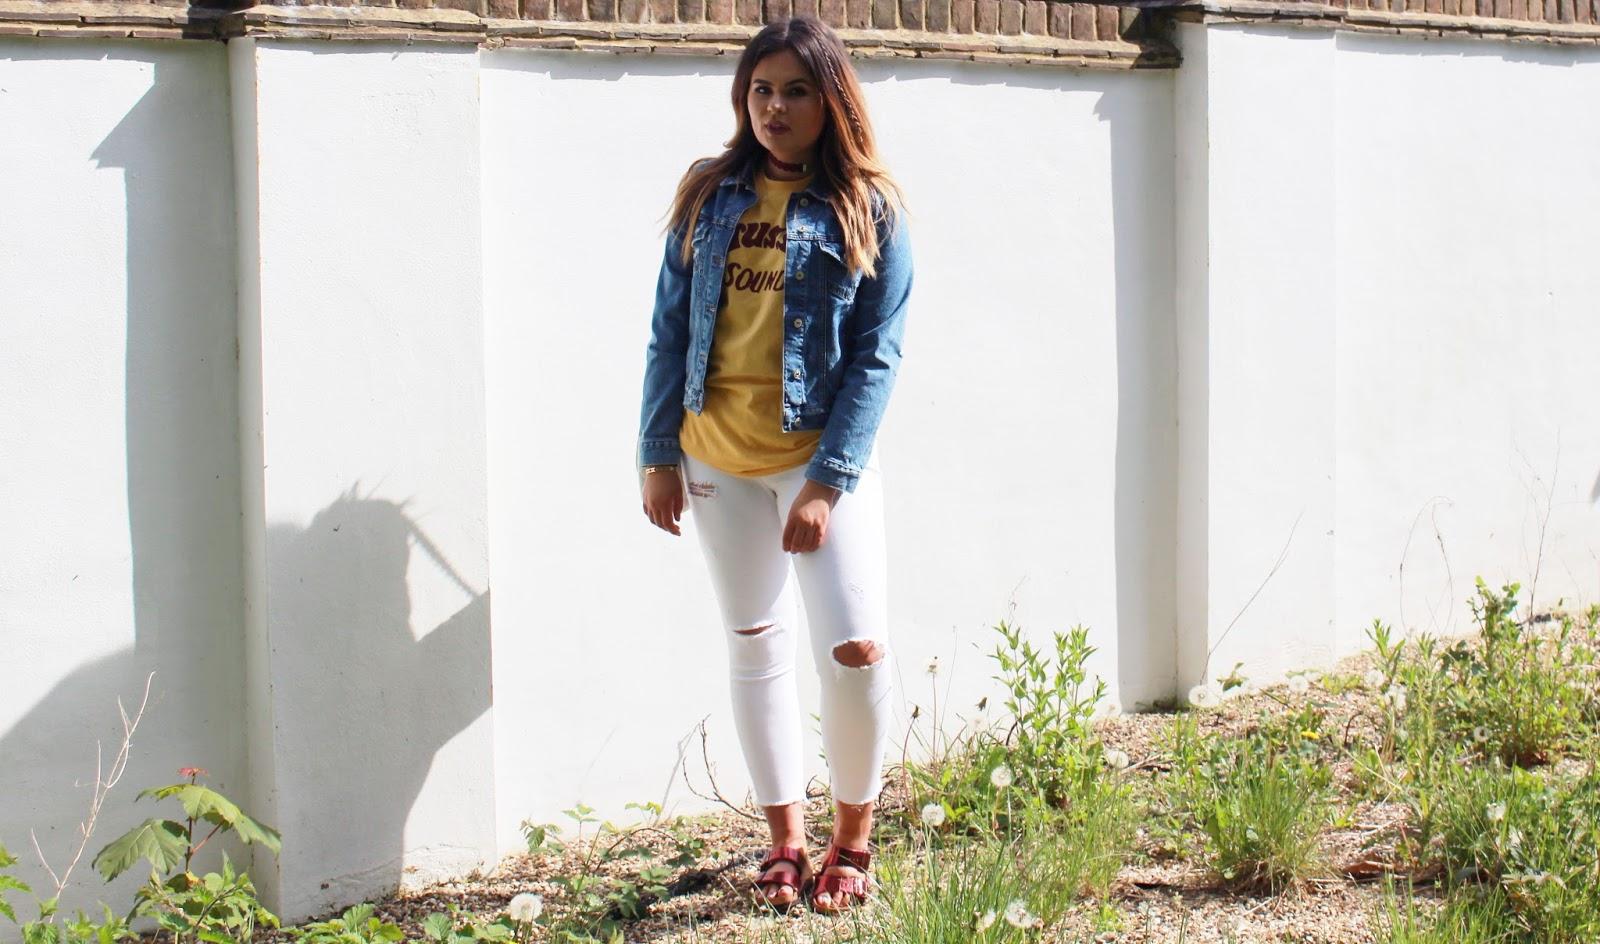 streetwear, stussy ss16, mango bowie jacket, vintage denim jacket, agolde jeans blogpost, summer casual outfit